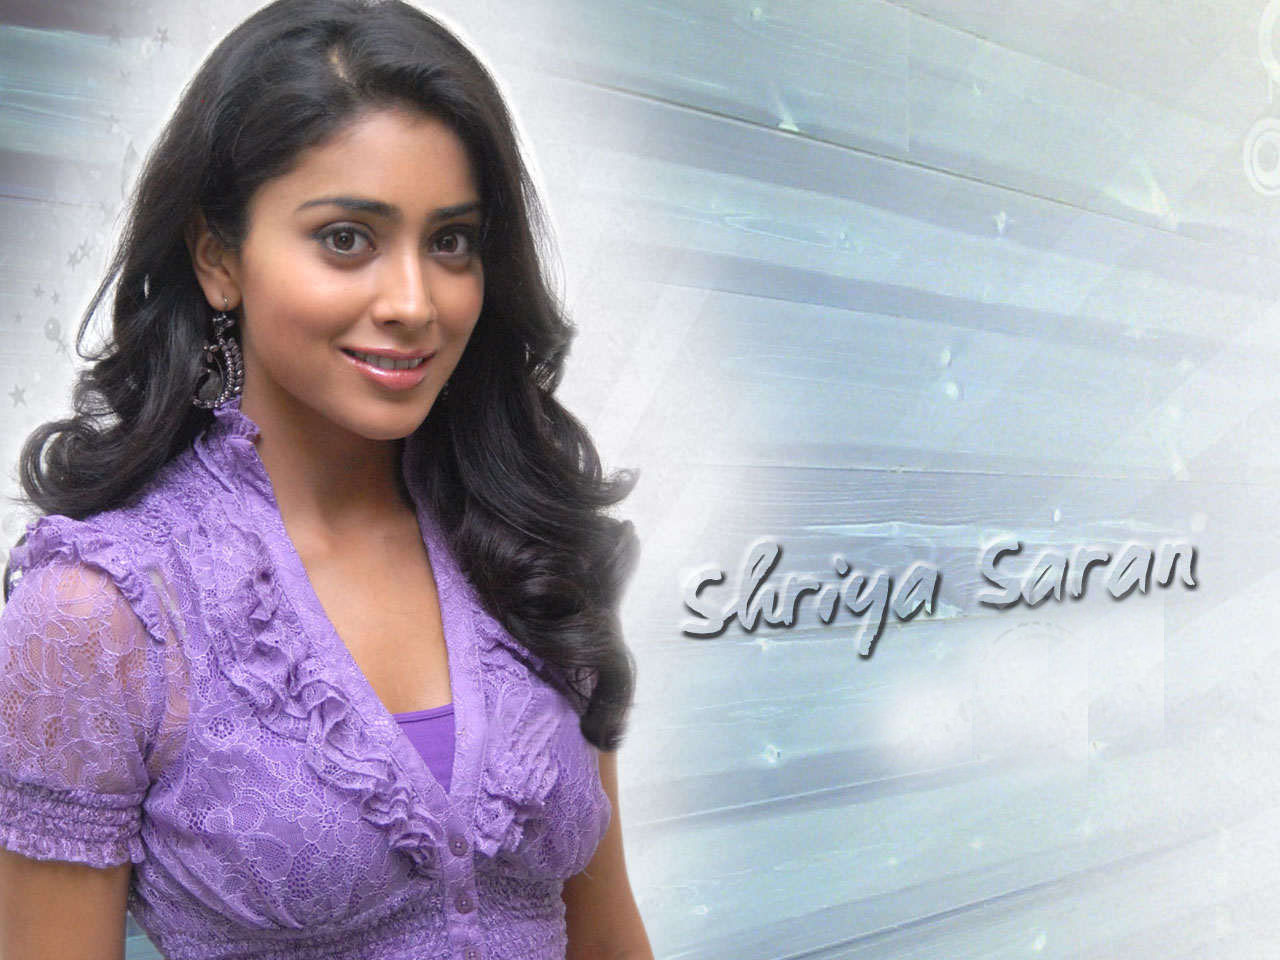 hd wallpapers for desktop: shriya saran wallpapers